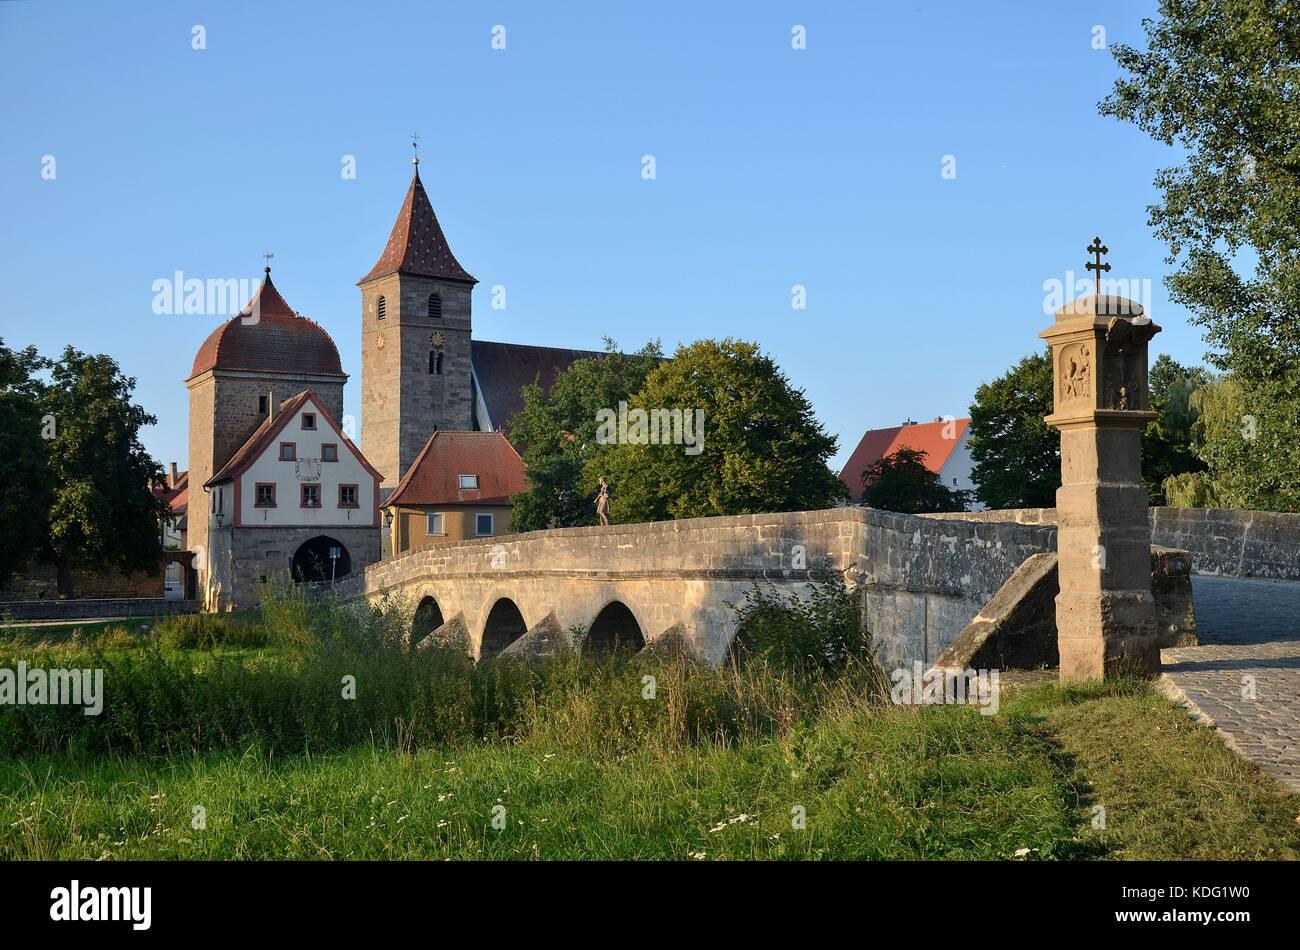 Die alte Stadt Ornbau in Franken - Stock Image